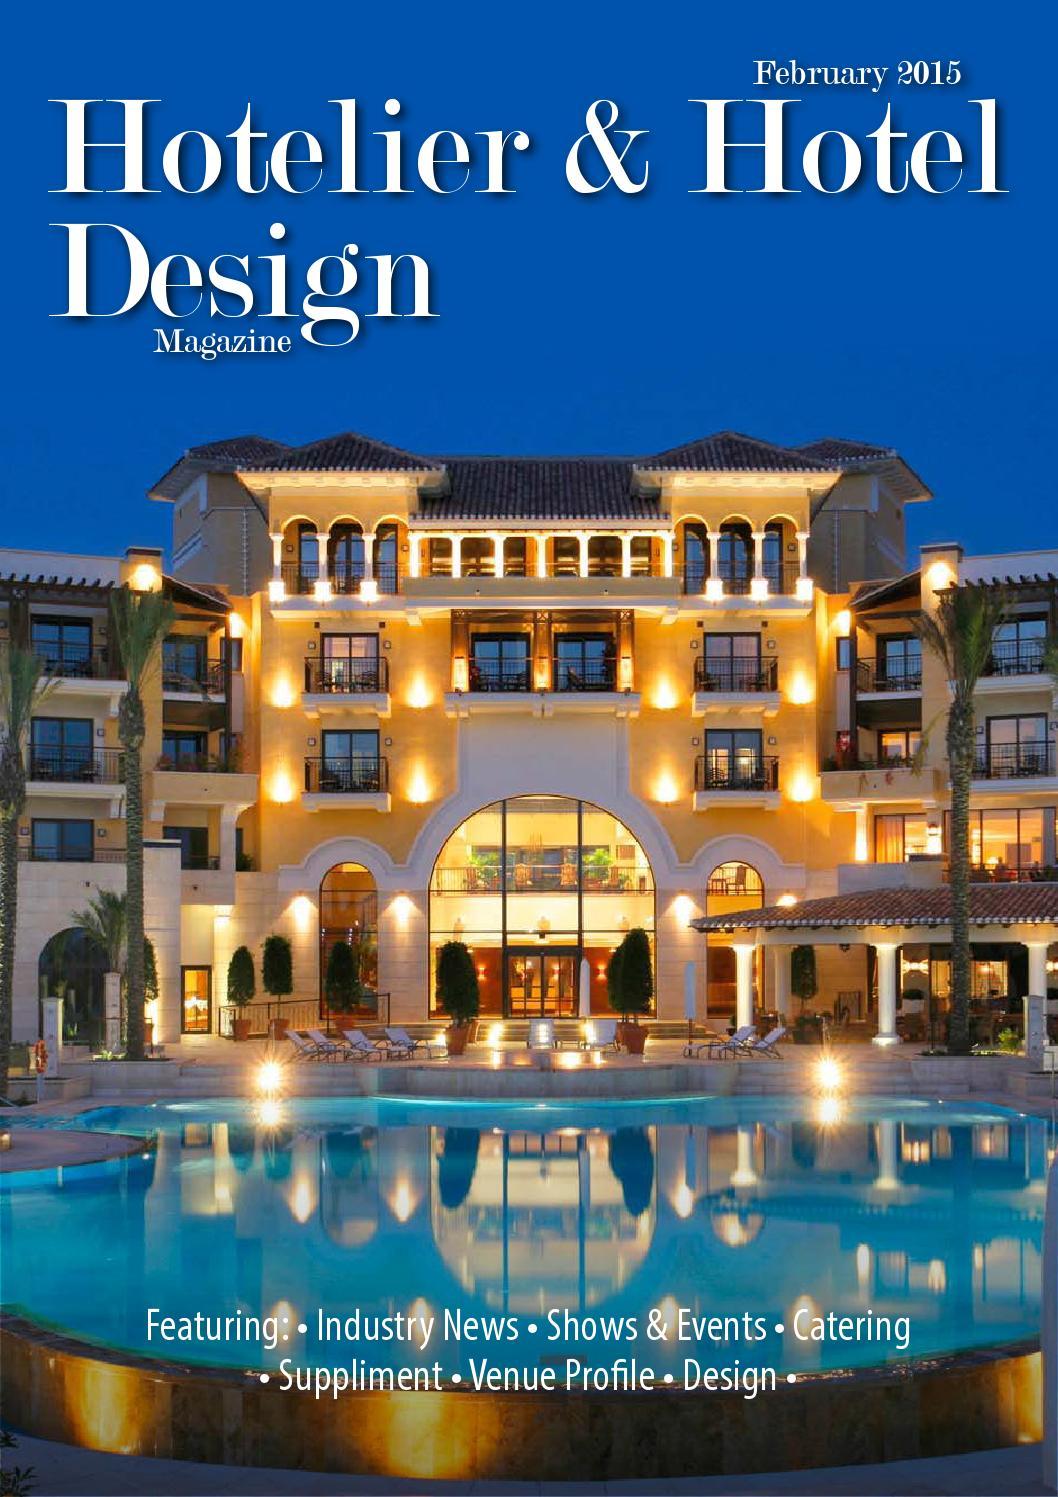 Hotelier hotel design february 2015 by jet digital for Design hotels 2015